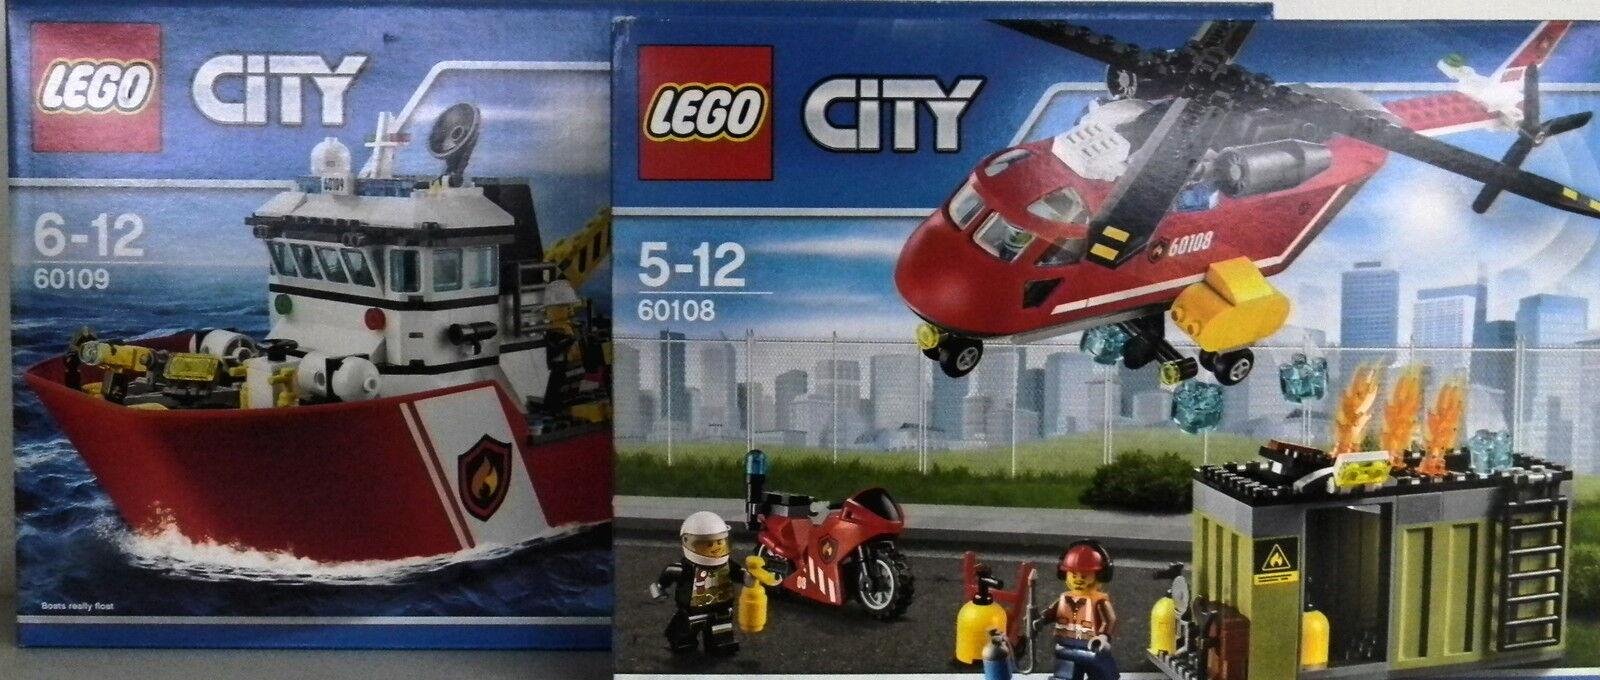 LEGO® CITY Feuerwehr 60108 & 60109 Bundle  NEU & ORIGINAL VERPACKT